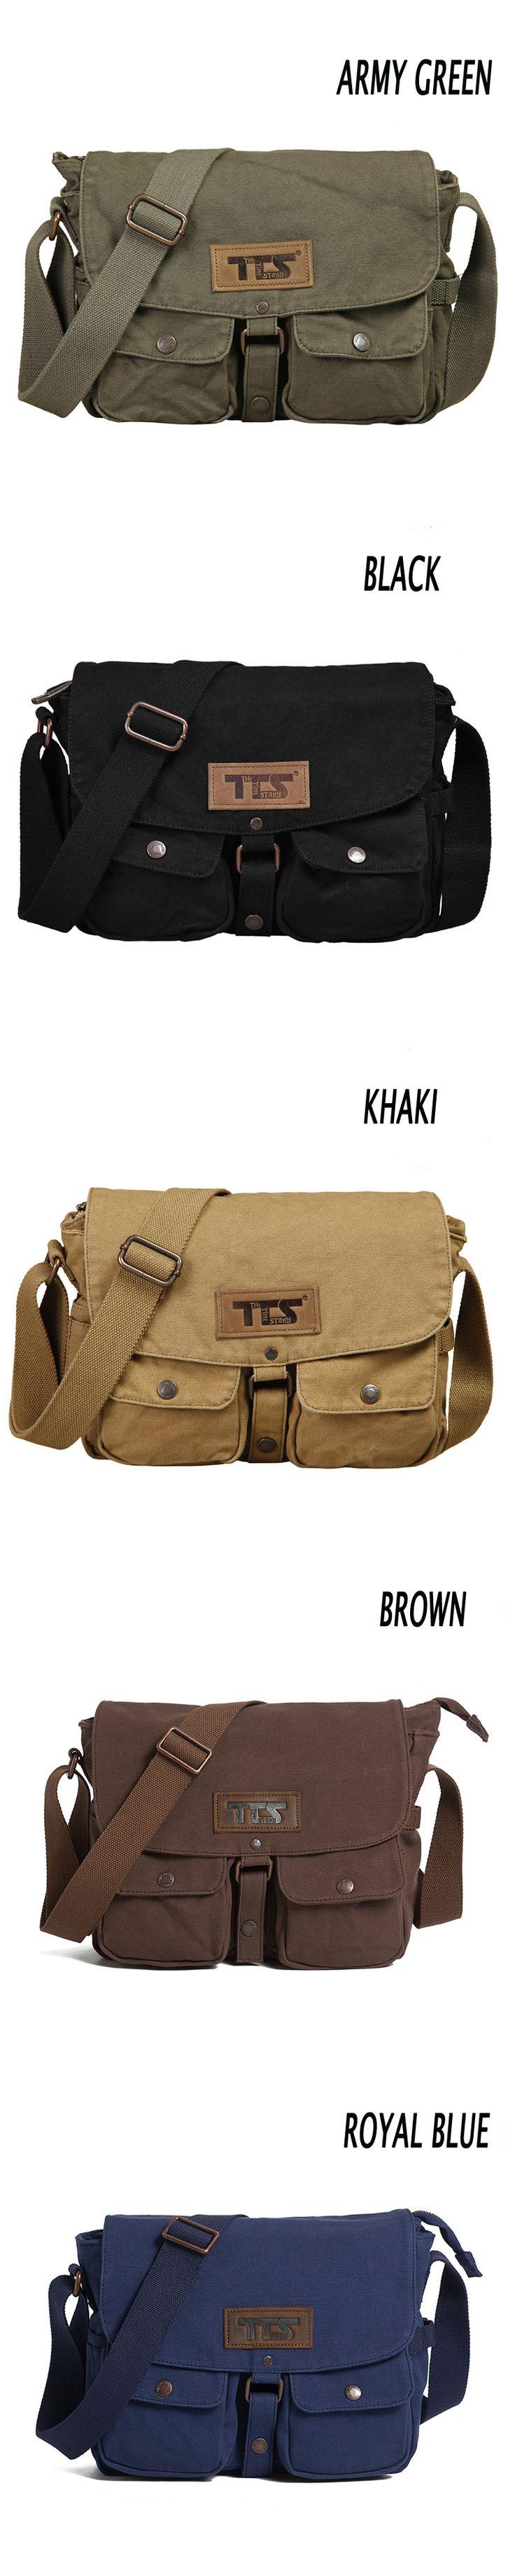 35$** Men's Women Canvas Shoulder Messenger School Book Bag Satchel Crossbody bag (GY01) #canvas #bag #men #women #school #satchel